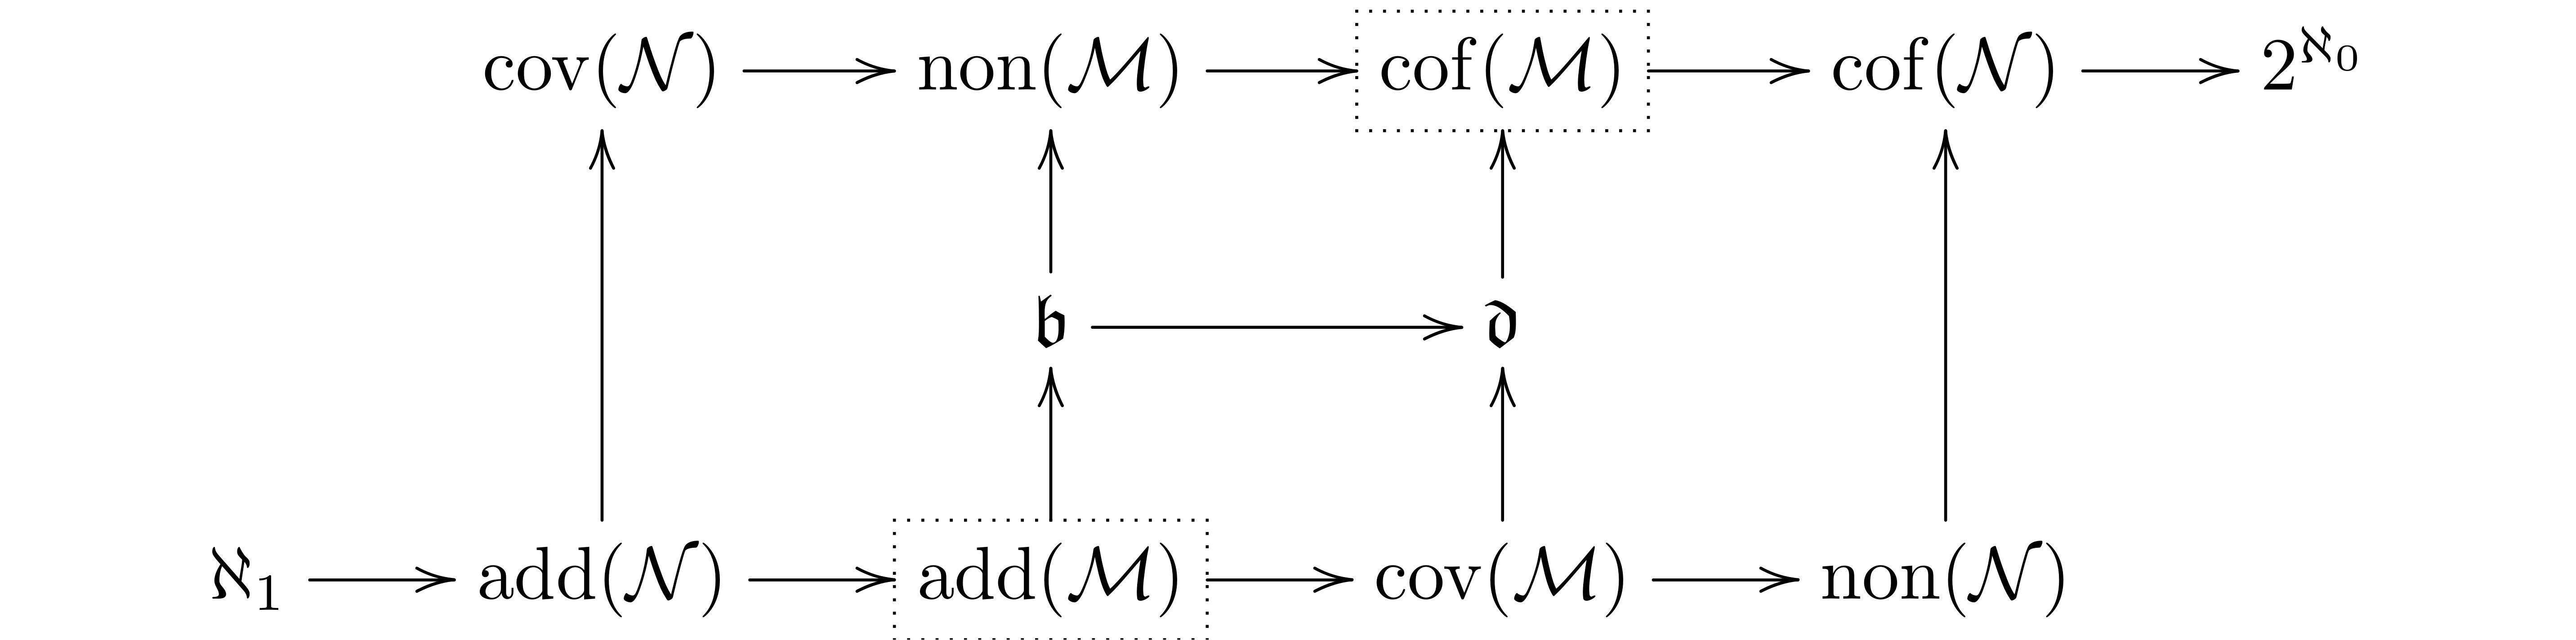 The intricacies of Cichoń's diagram.